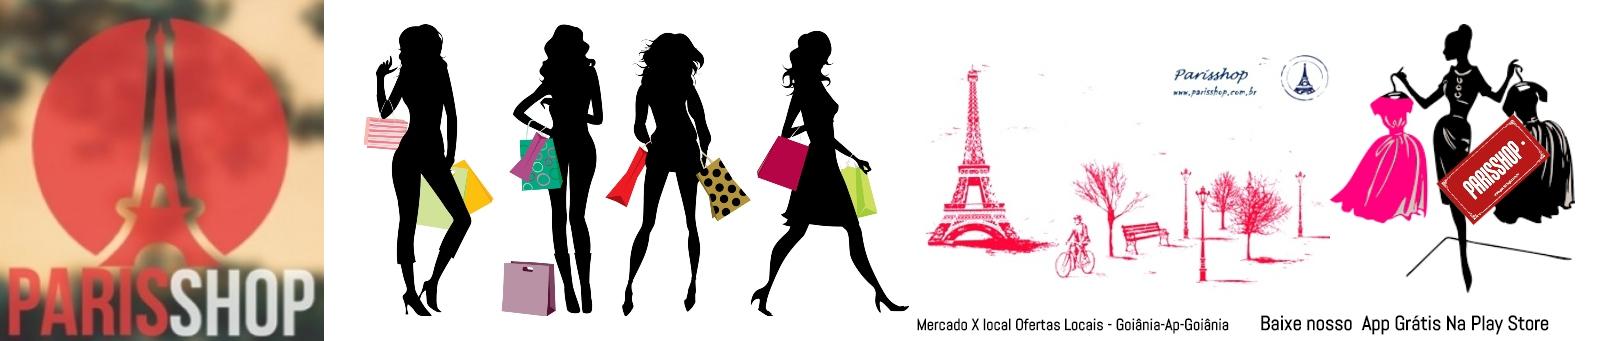 parisshop modas.jpg